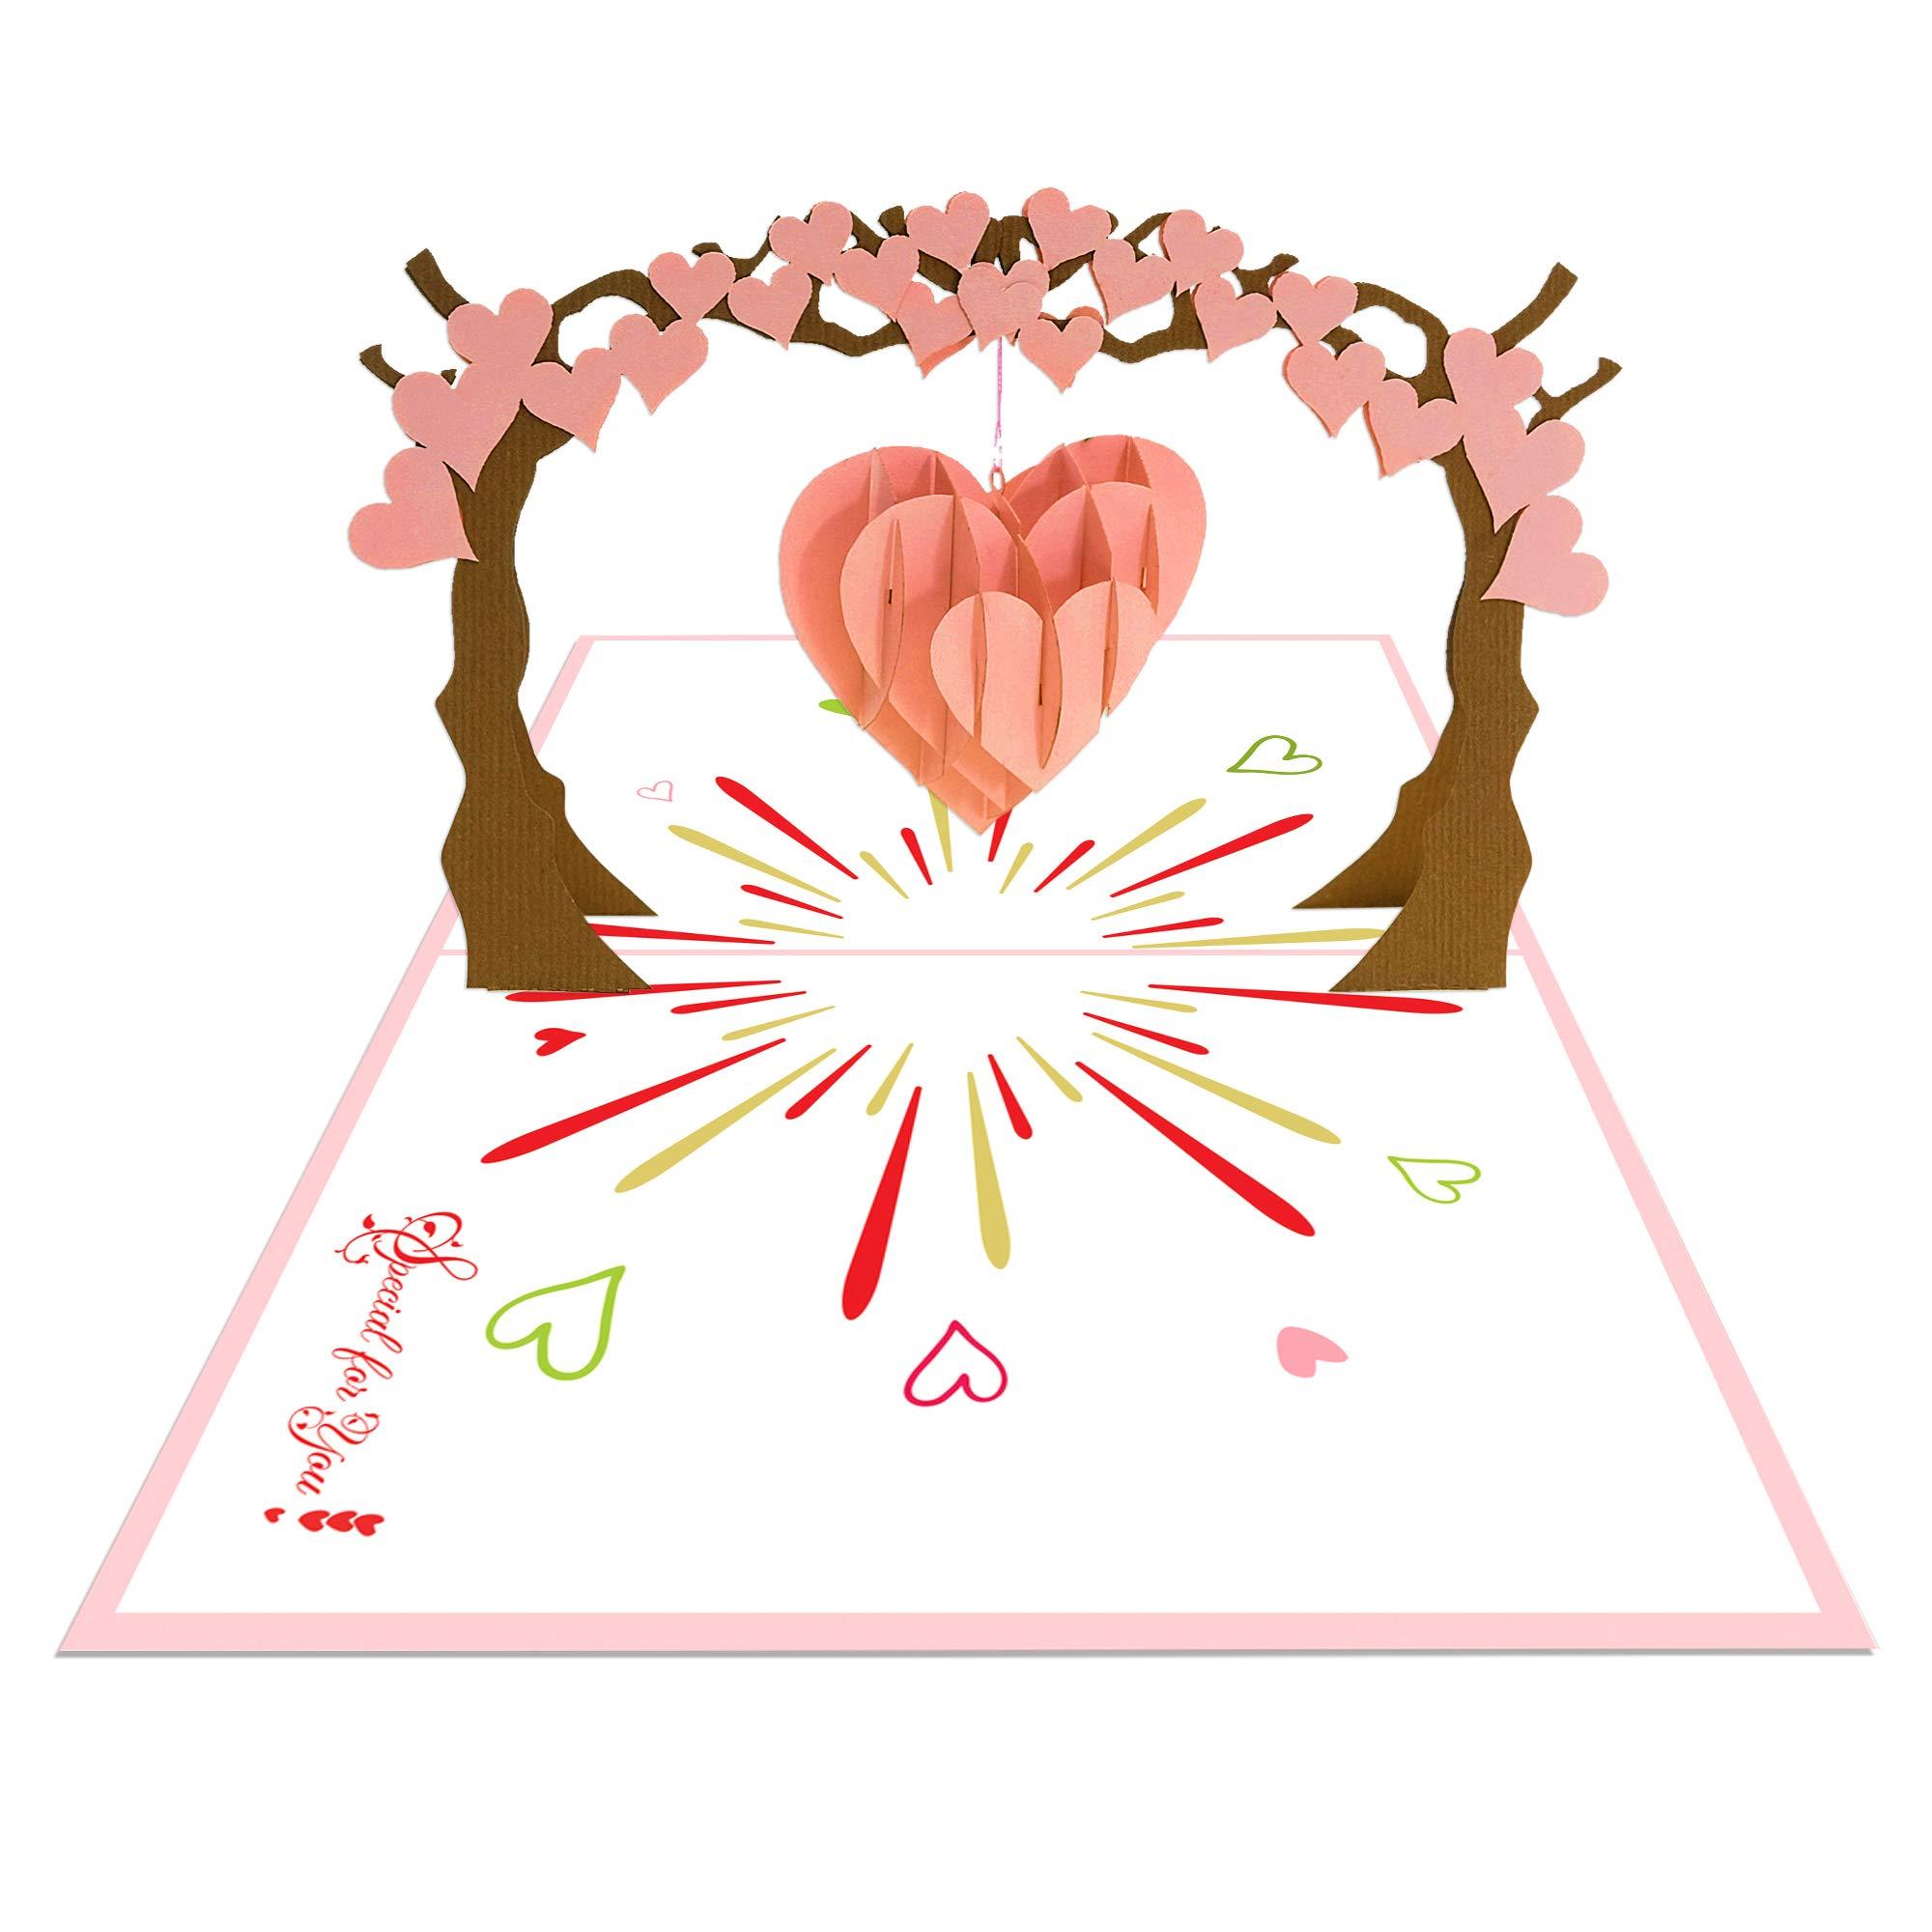 Ninrio 3D Card - Love Tree 3D Card - COMBO 5 PCS - Love 3D Card, Greeting Card, Pop up Card, Anniversary Card, Wedding 3D Card, Invitation Card, Birthday Card, Thank You Card, 3D Card (5) by Ninrio